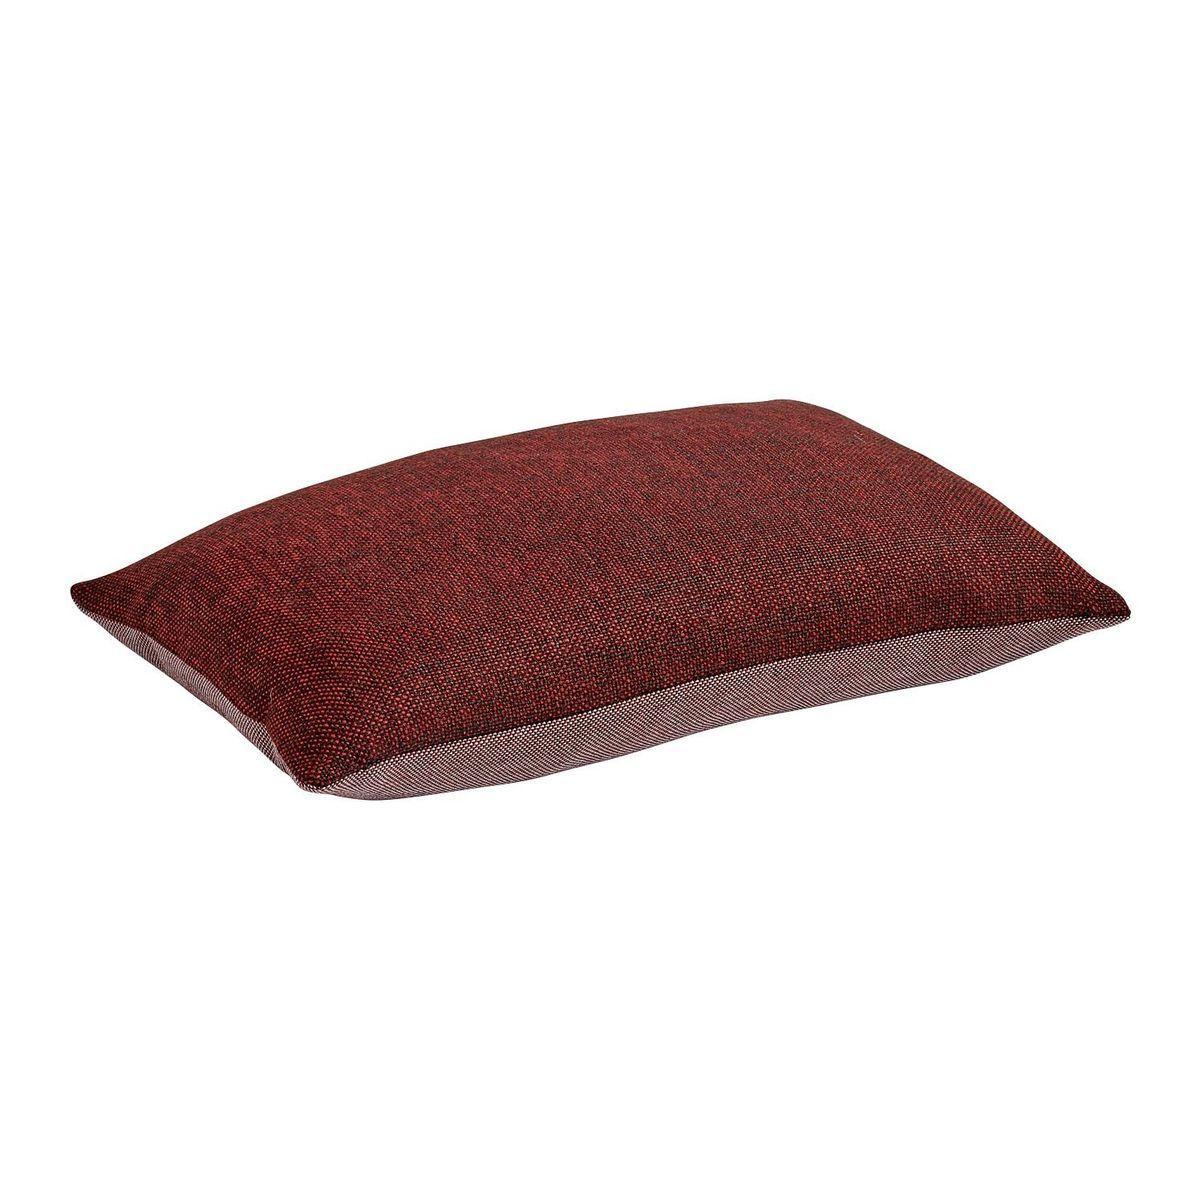 Kissen Hay eclectic cushion kissen 45x30cm hay ambientedirect com